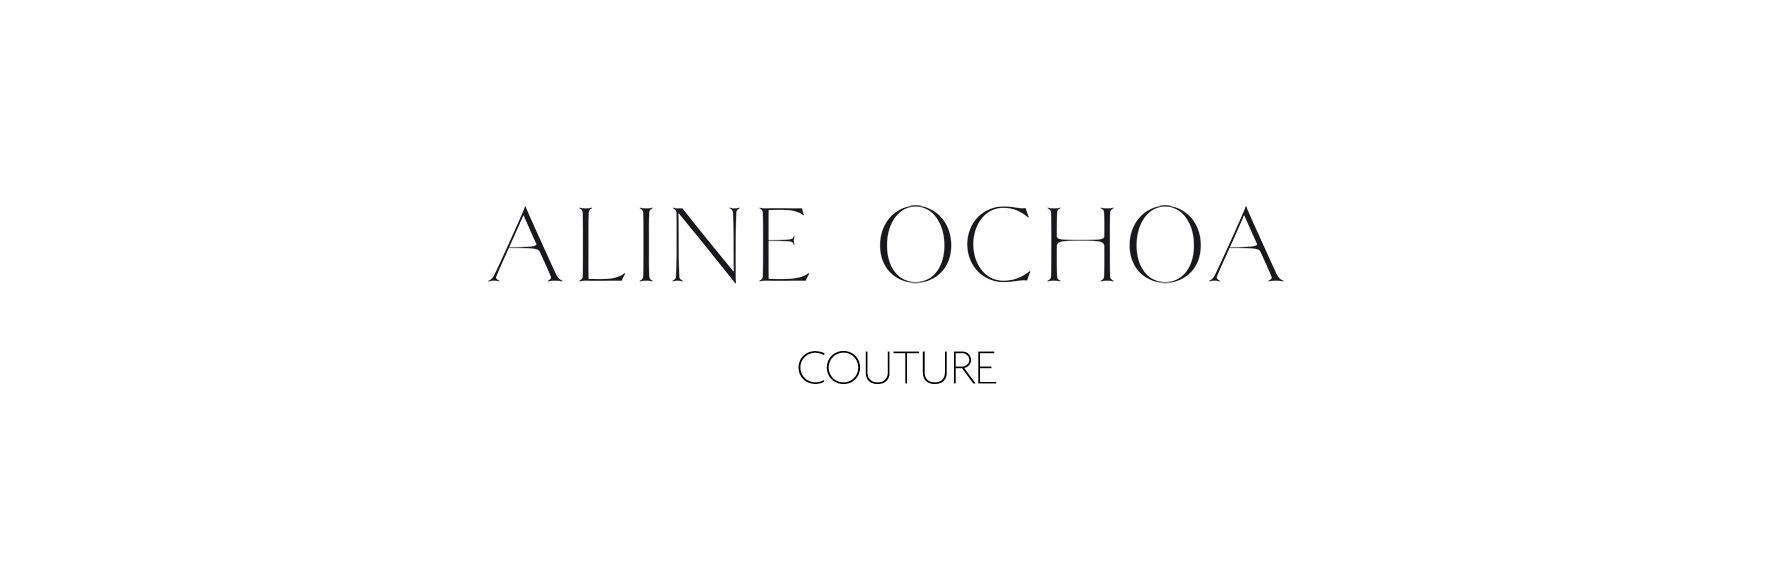 Aline Ochoa couture webpagecover_S.jpg